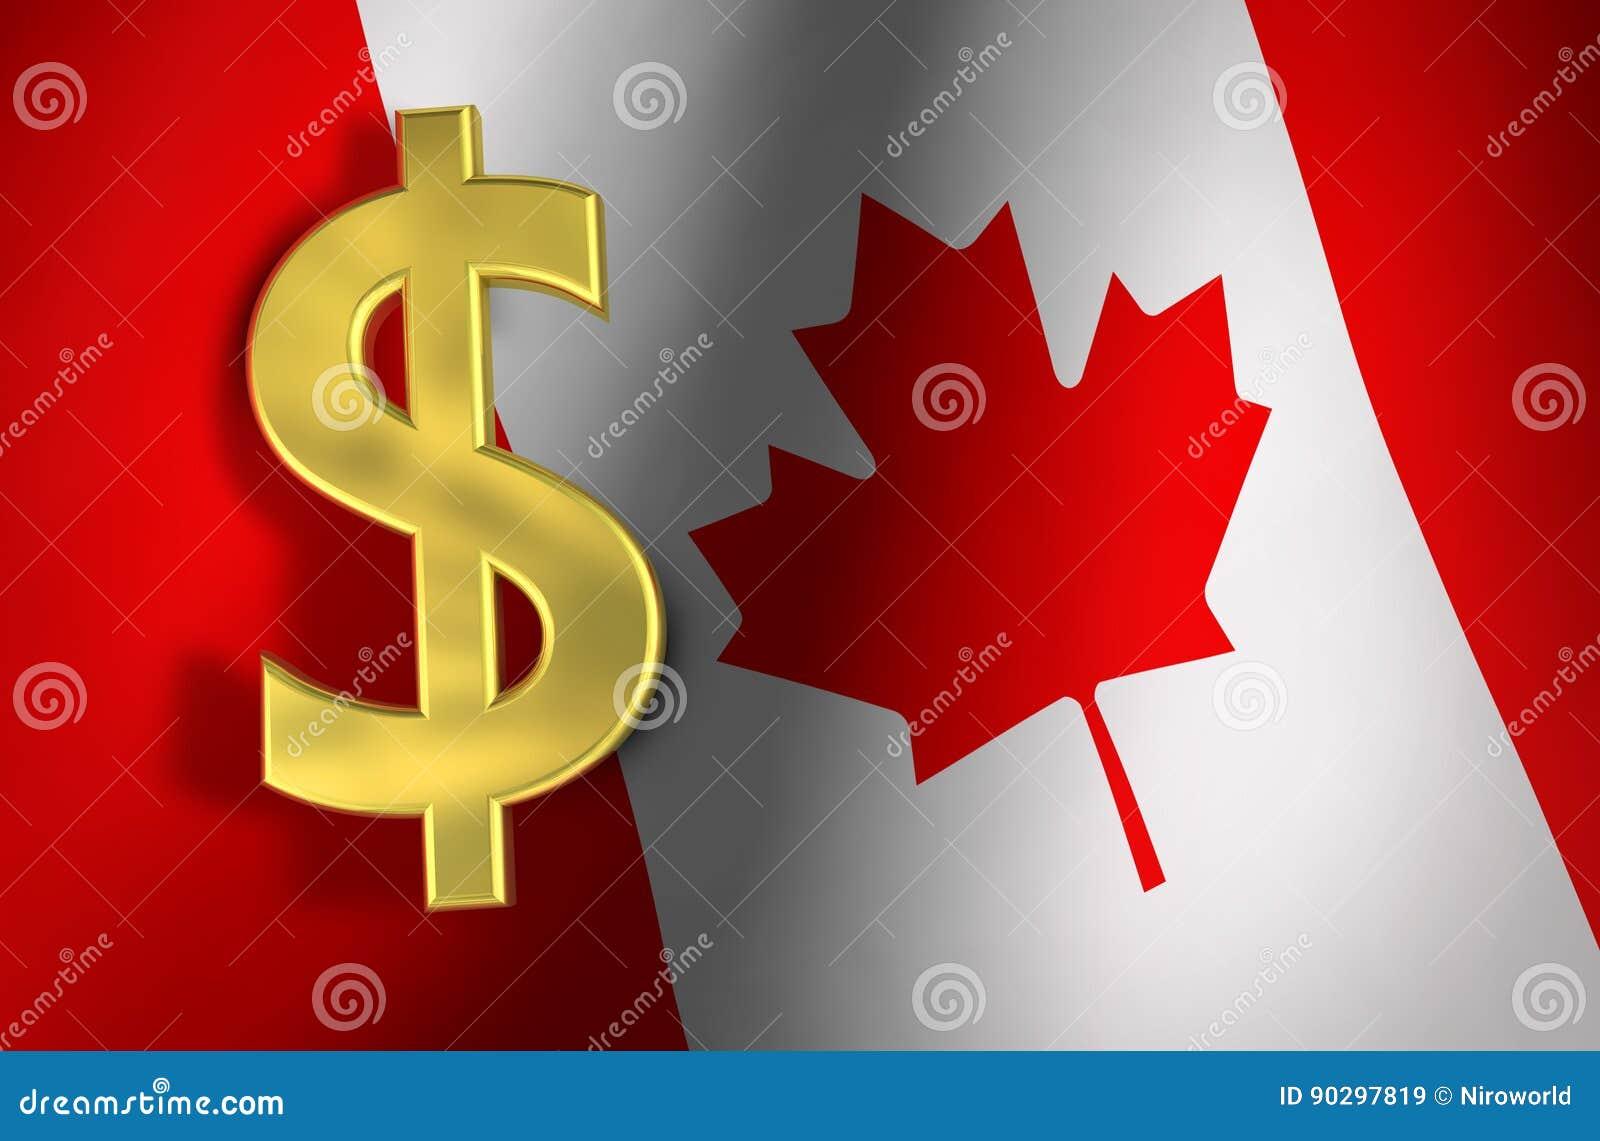 Canadian Dollar Symbol Canada Economy Concept Stock Illustration